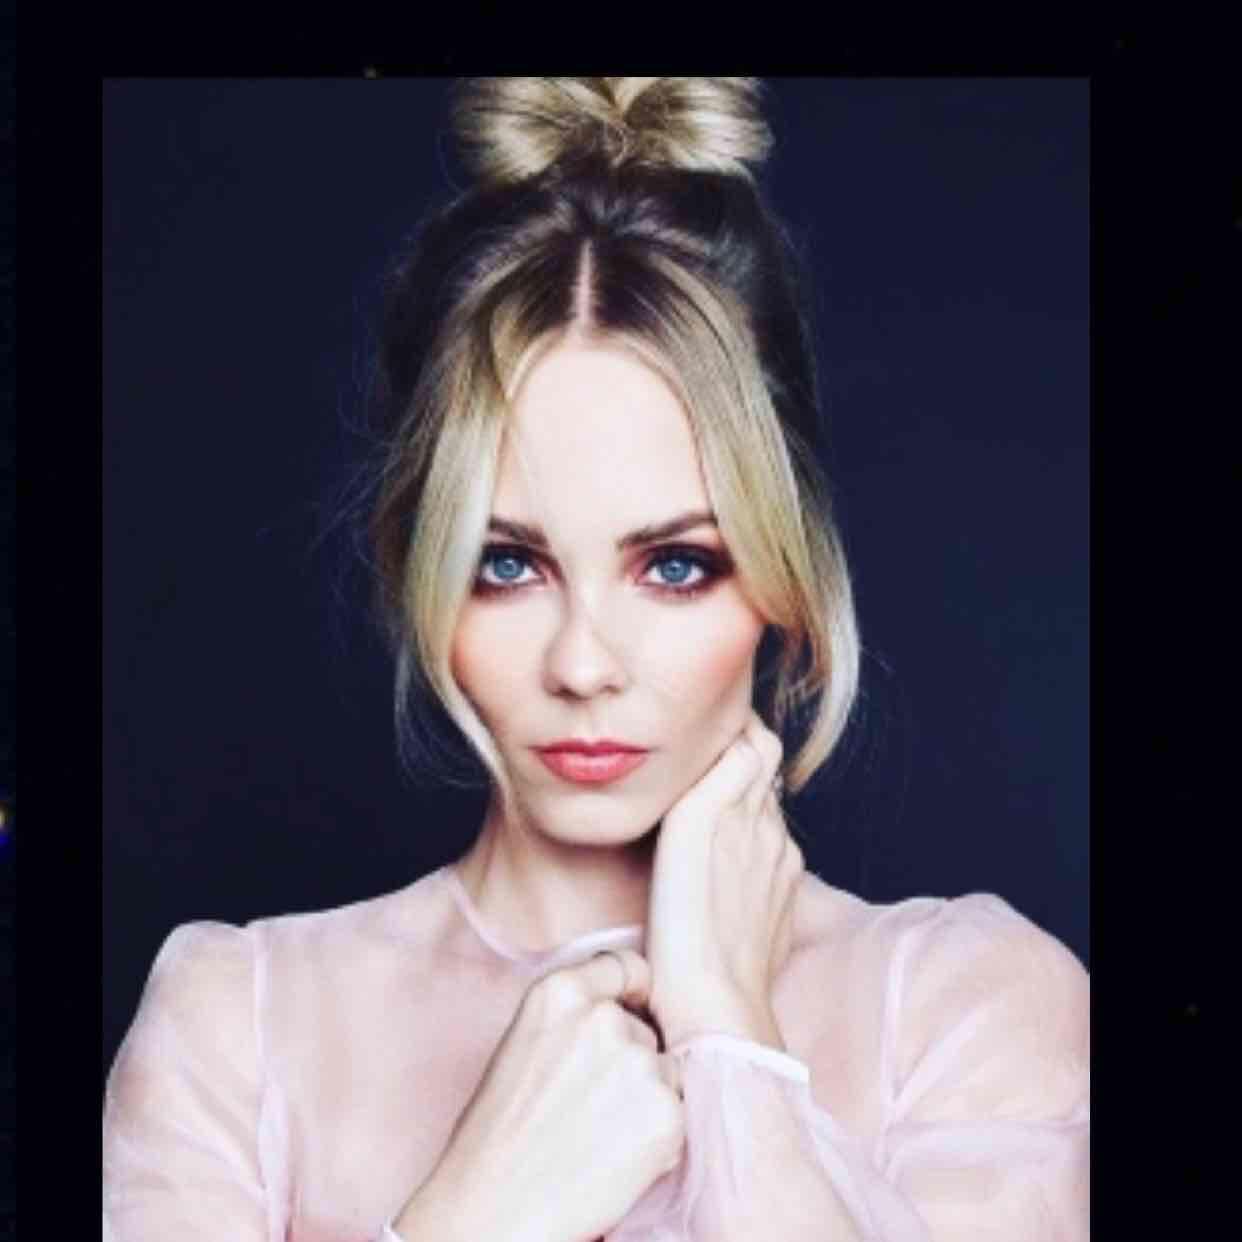 Avatar of Laura Vandervoort